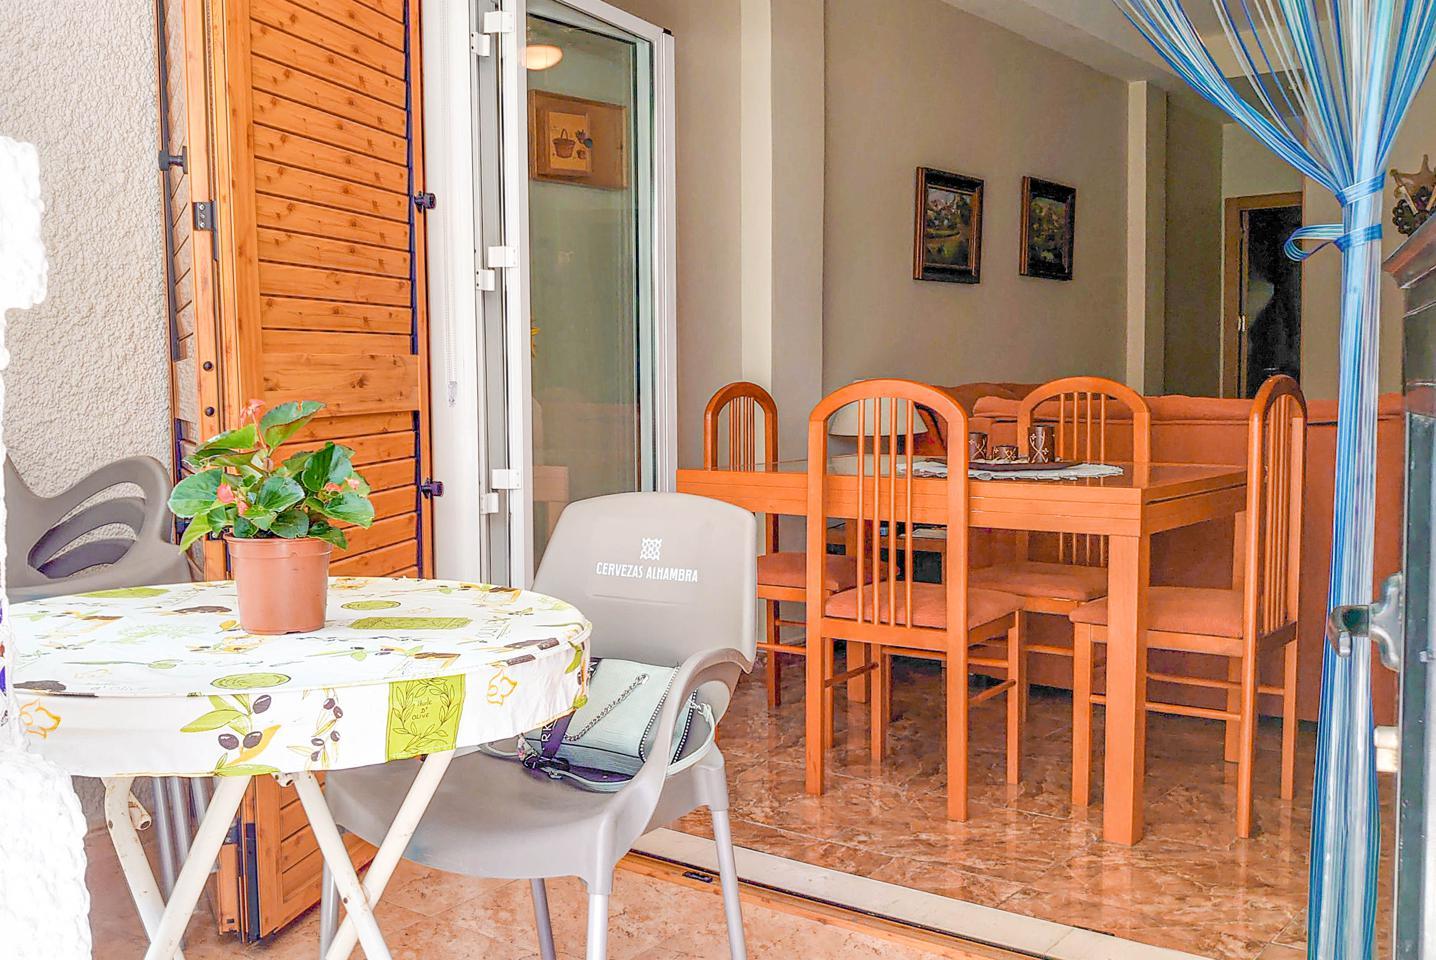 Bungalow en venta en Santa Pola, Tamarit – #2295